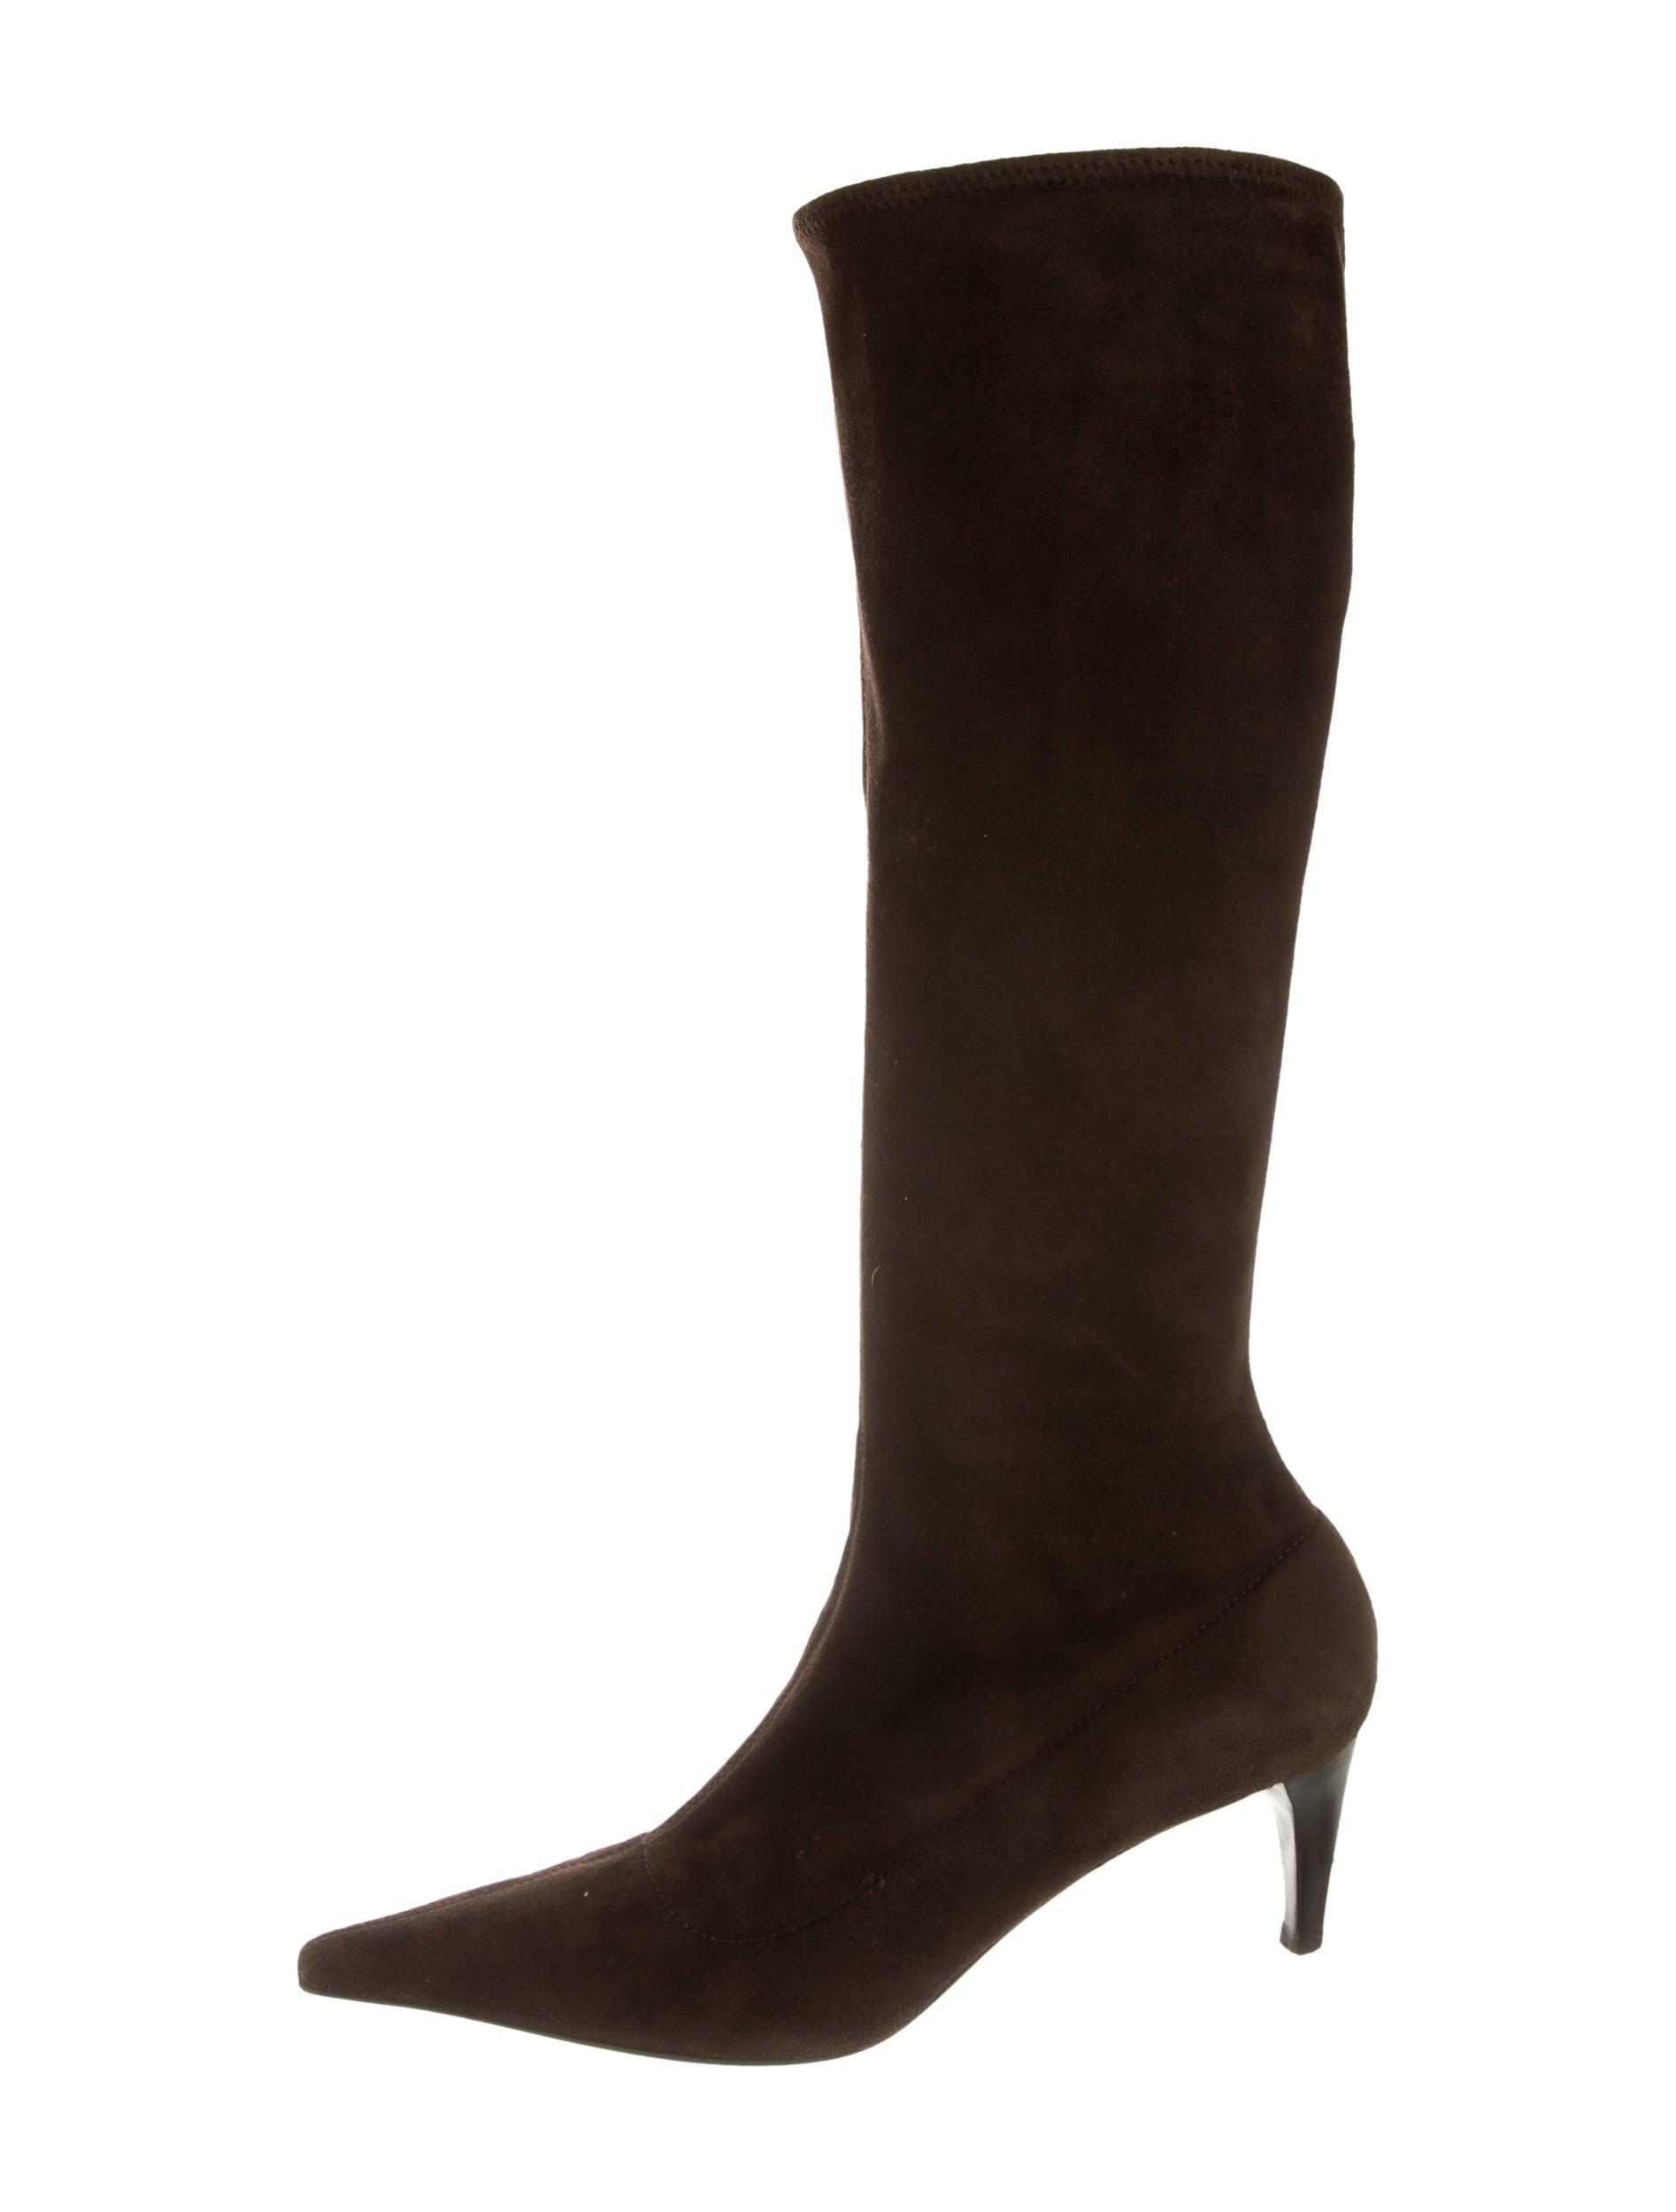 prada suede knee high boots shoes pra104956 the realreal